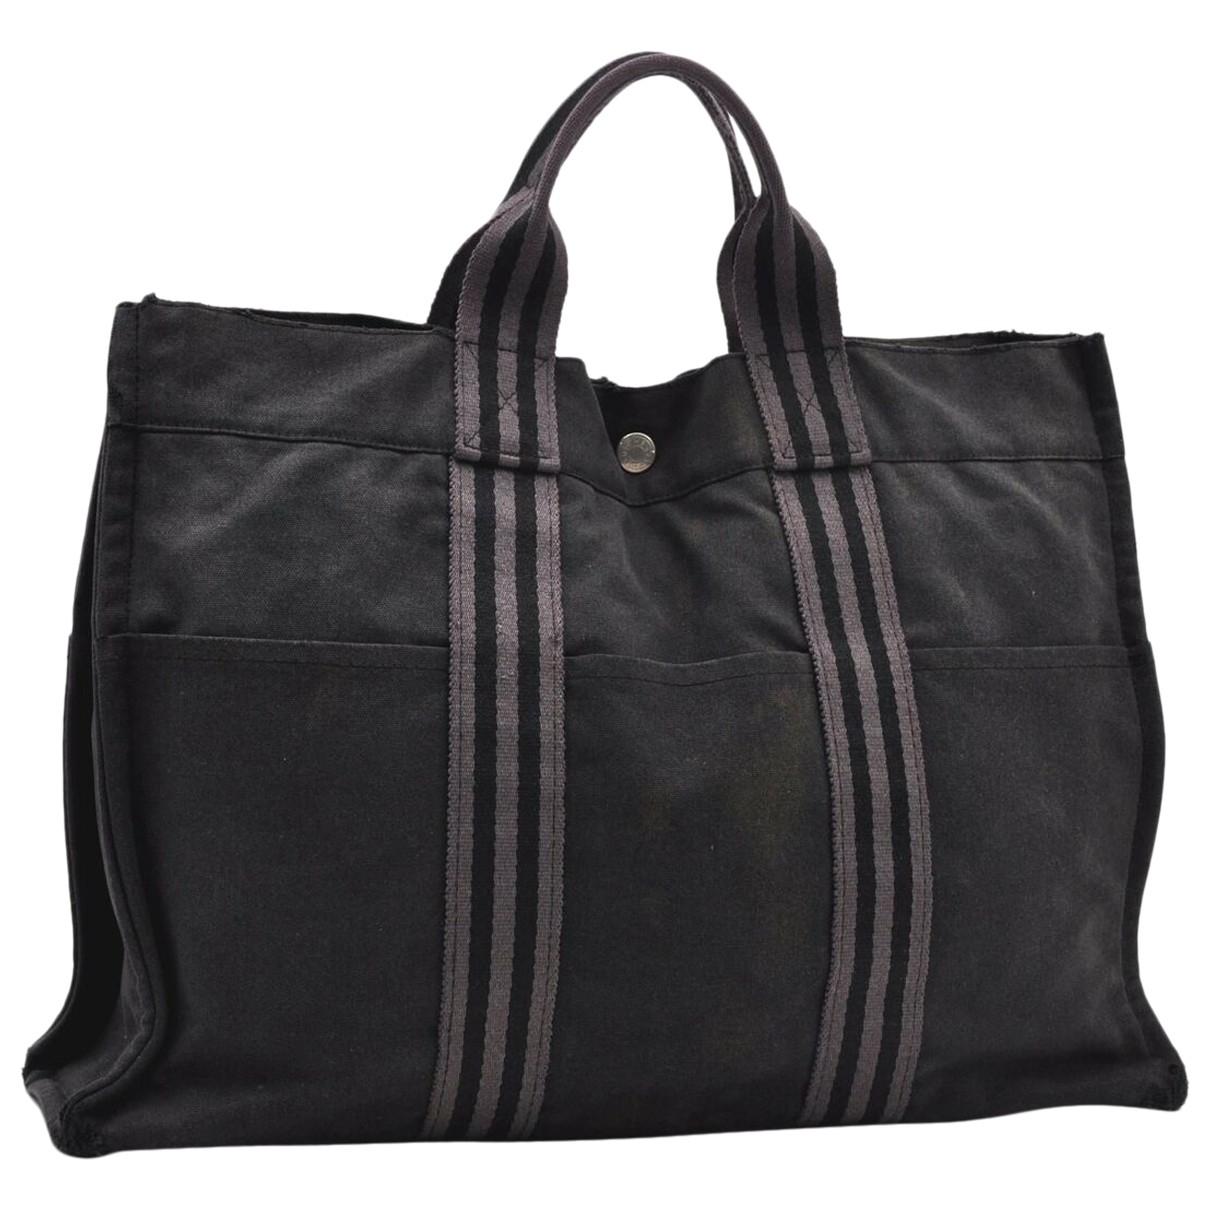 Hermes Herline Handtasche in  Schwarz Leinen